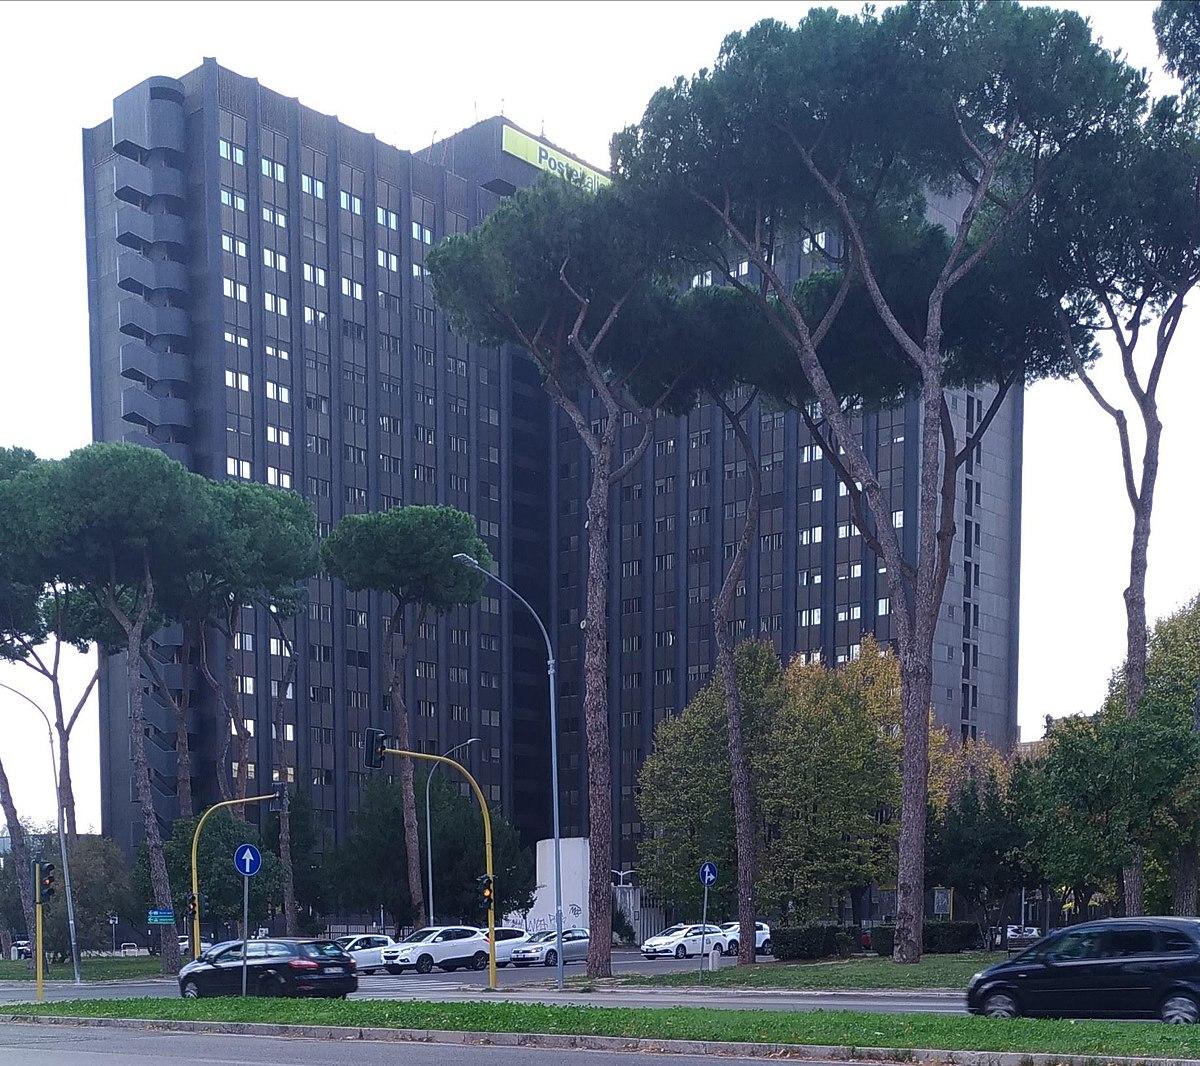 5d527ca184 Poste italiane - Wikipedia